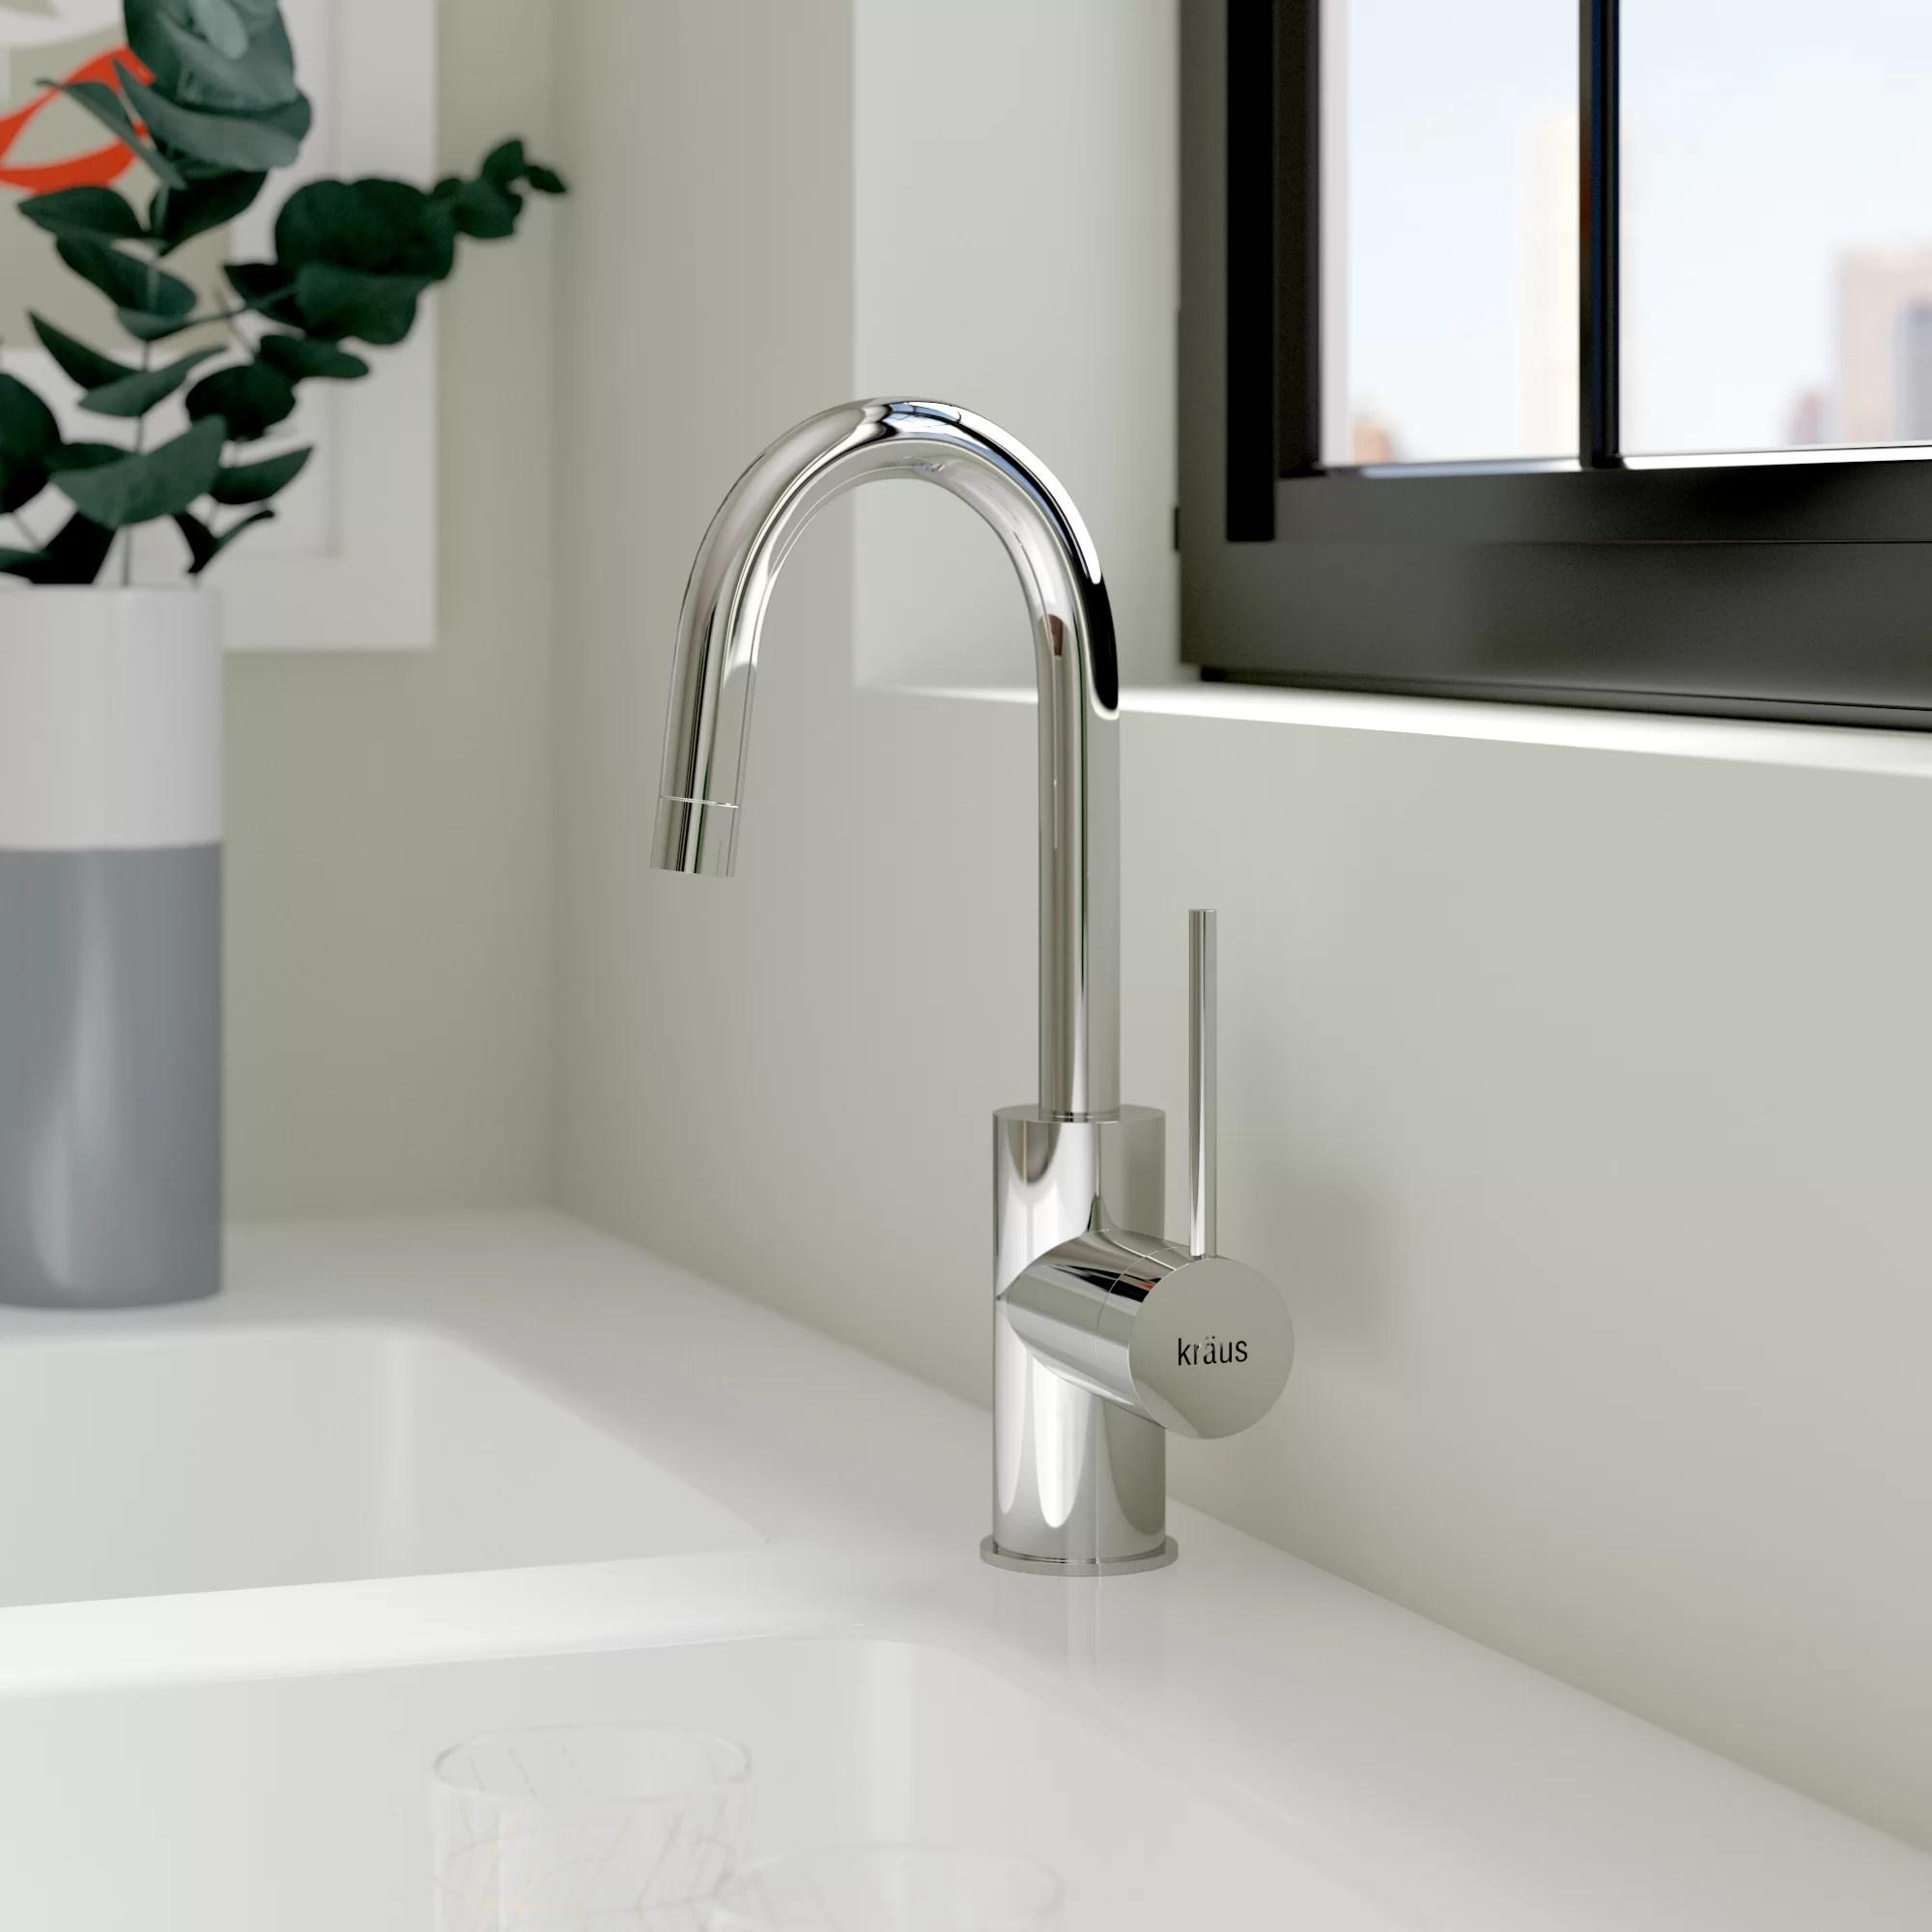 oletto single handle kitchen faucet